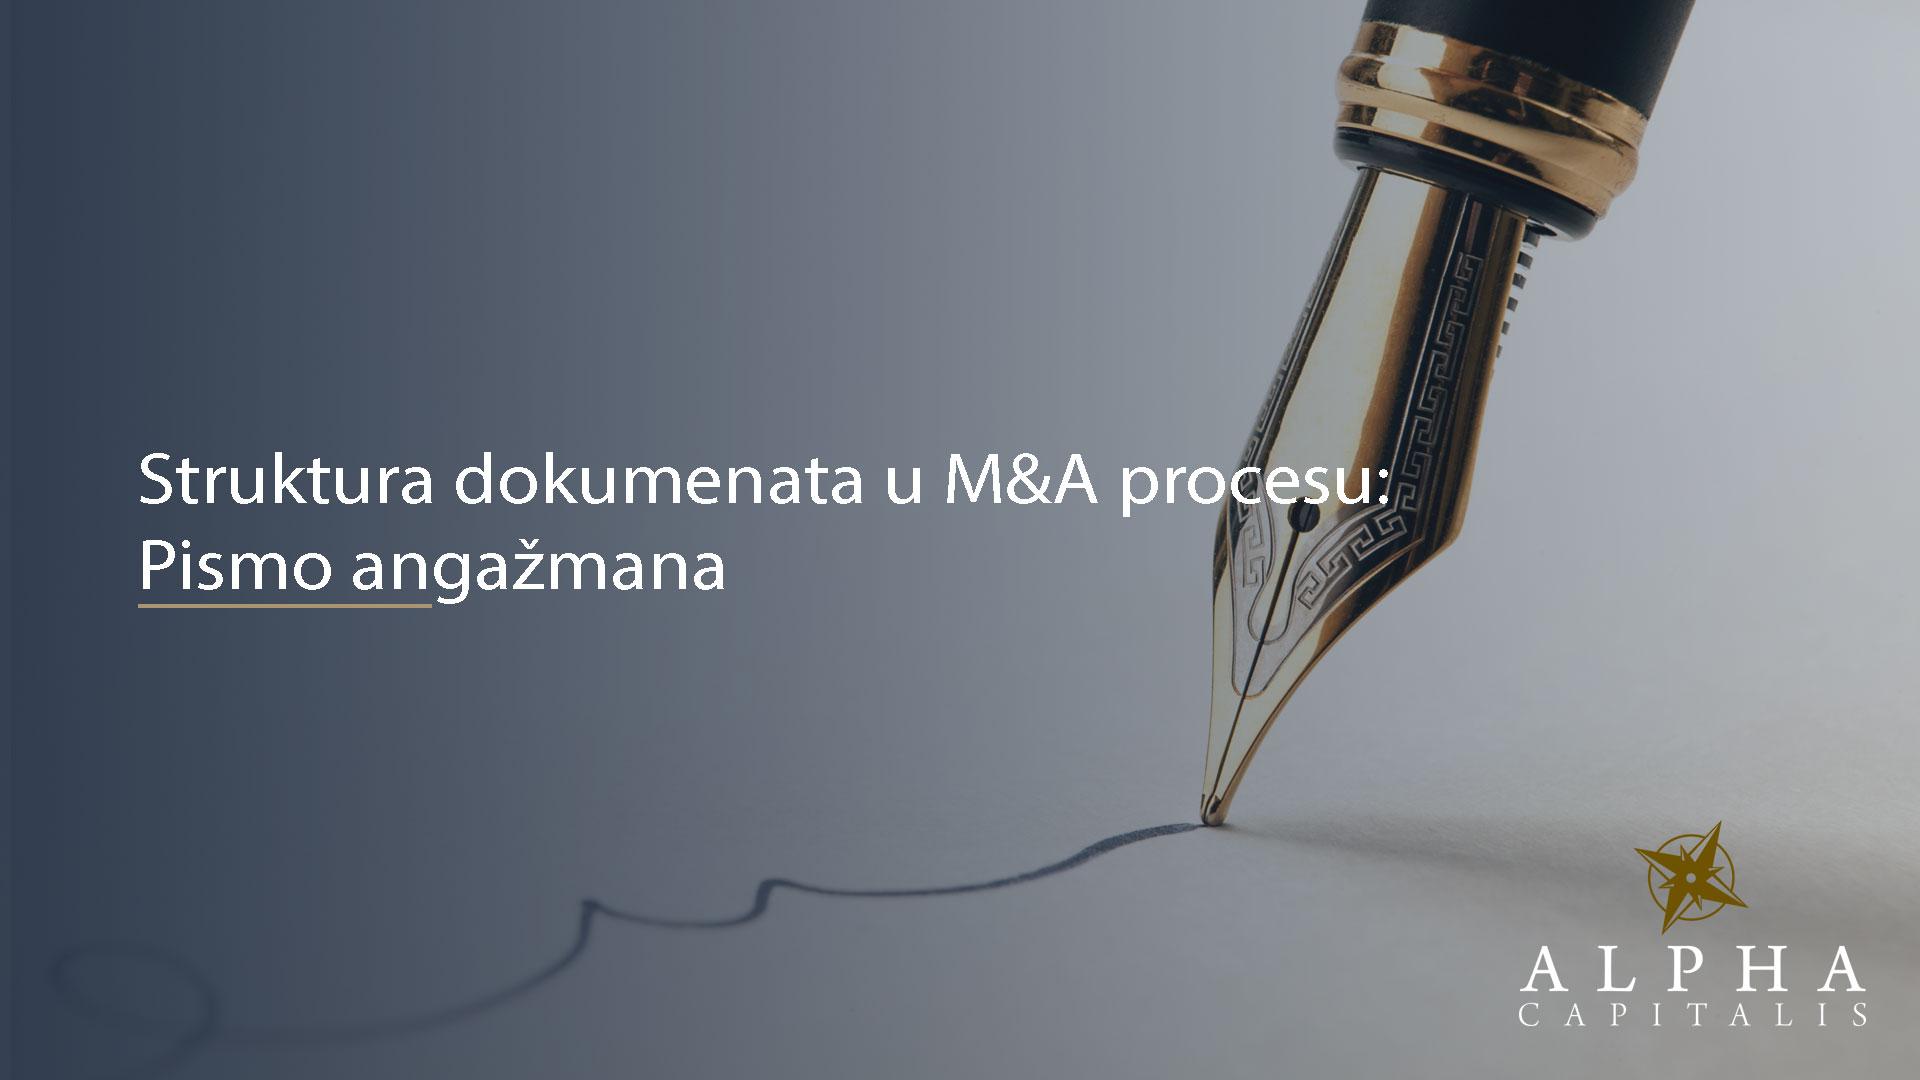 alpha-capitalis-pismo-angažmana-M&A_template